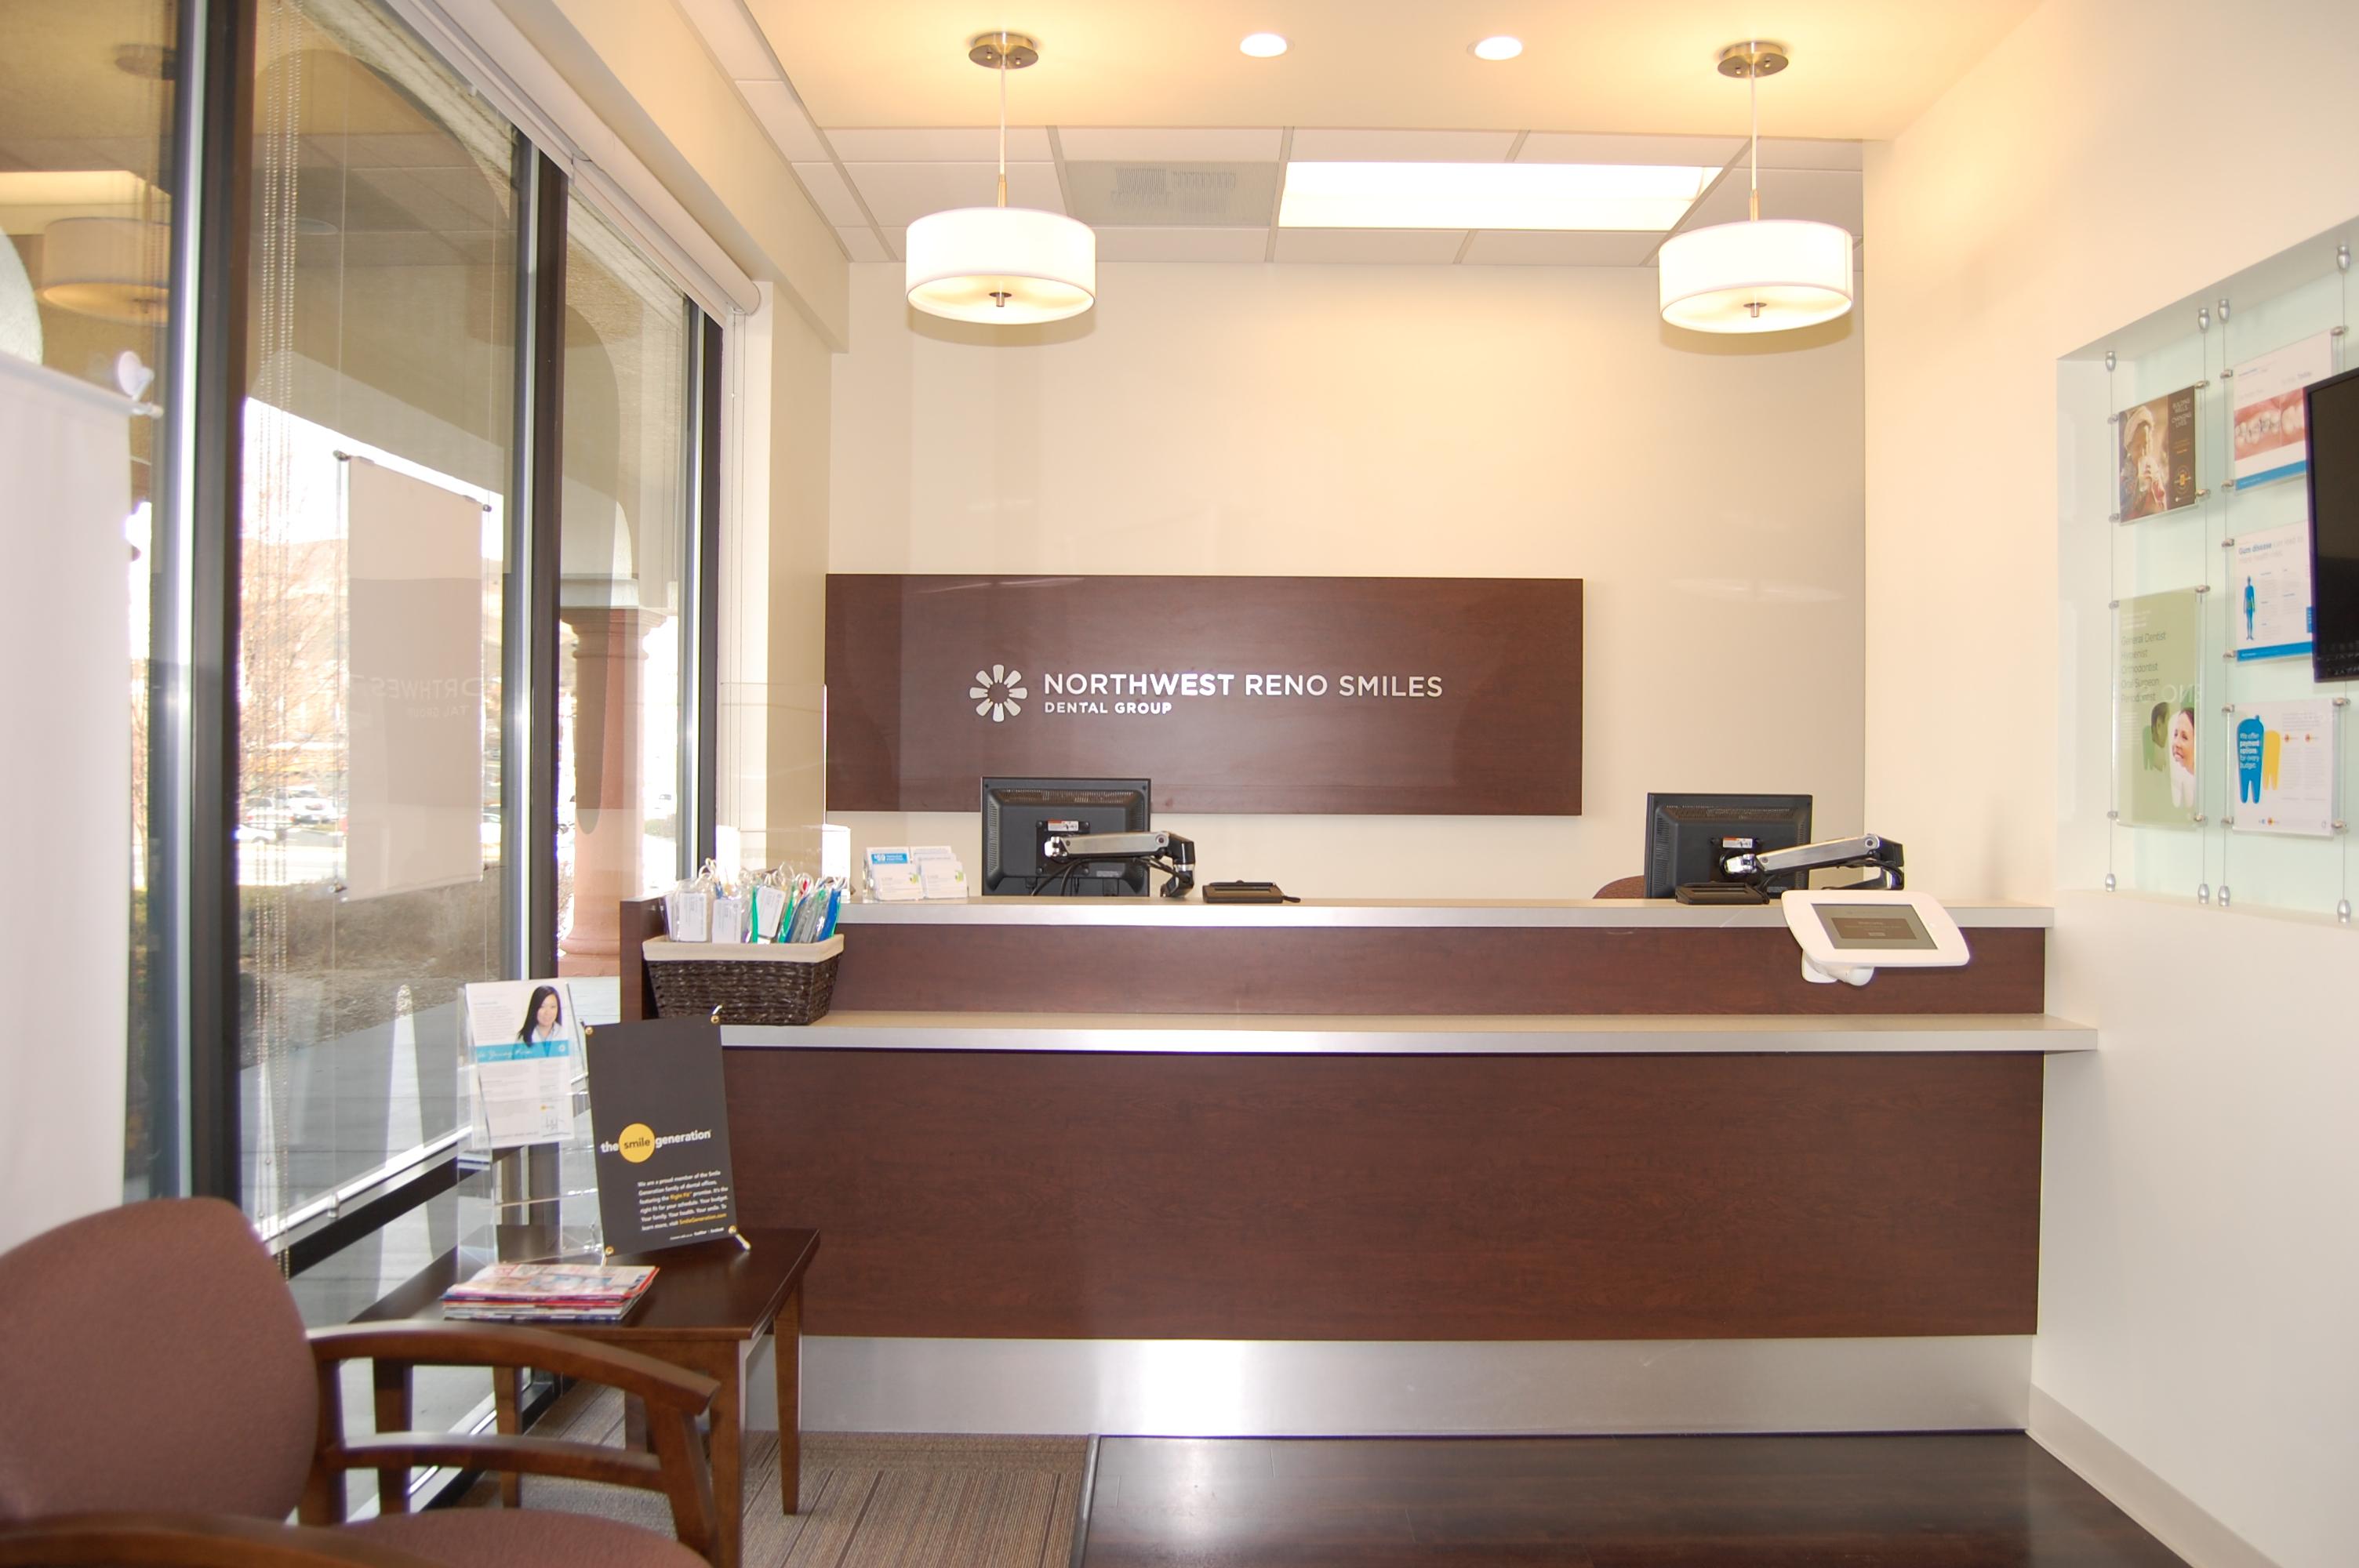 Northwest Reno Smiles Dental Group image 2